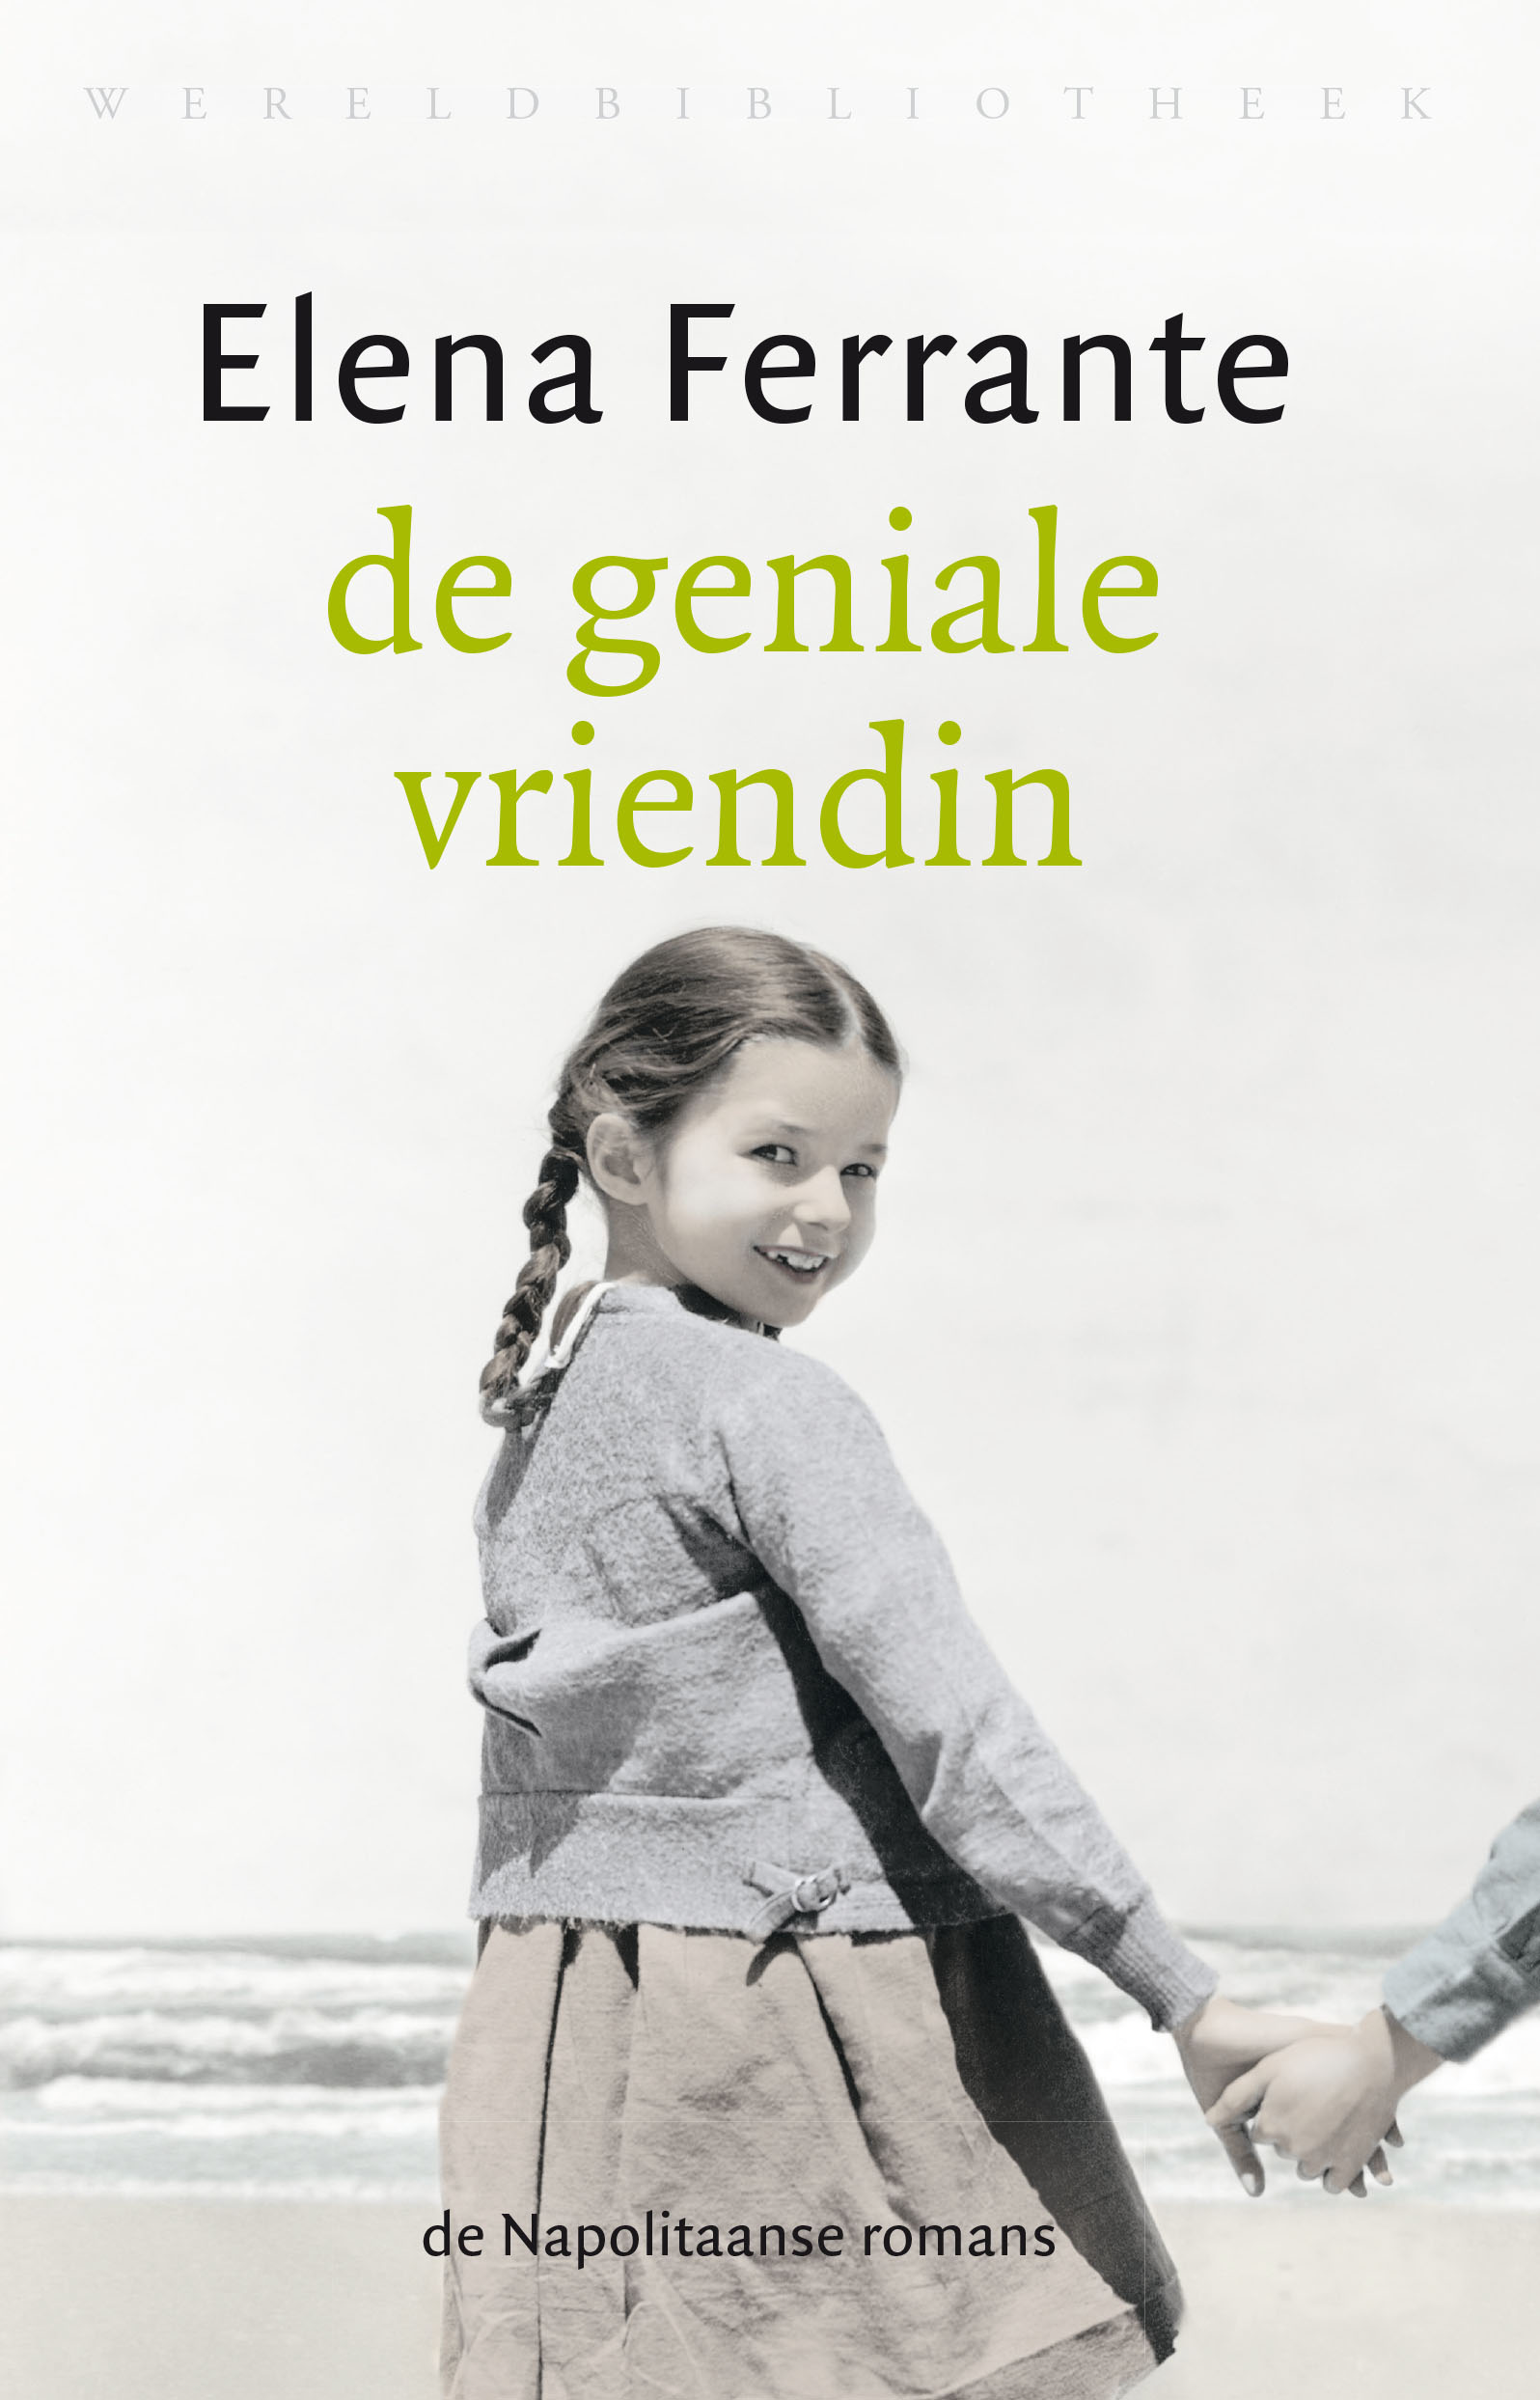 De geniale vriendin – Elena Ferrante